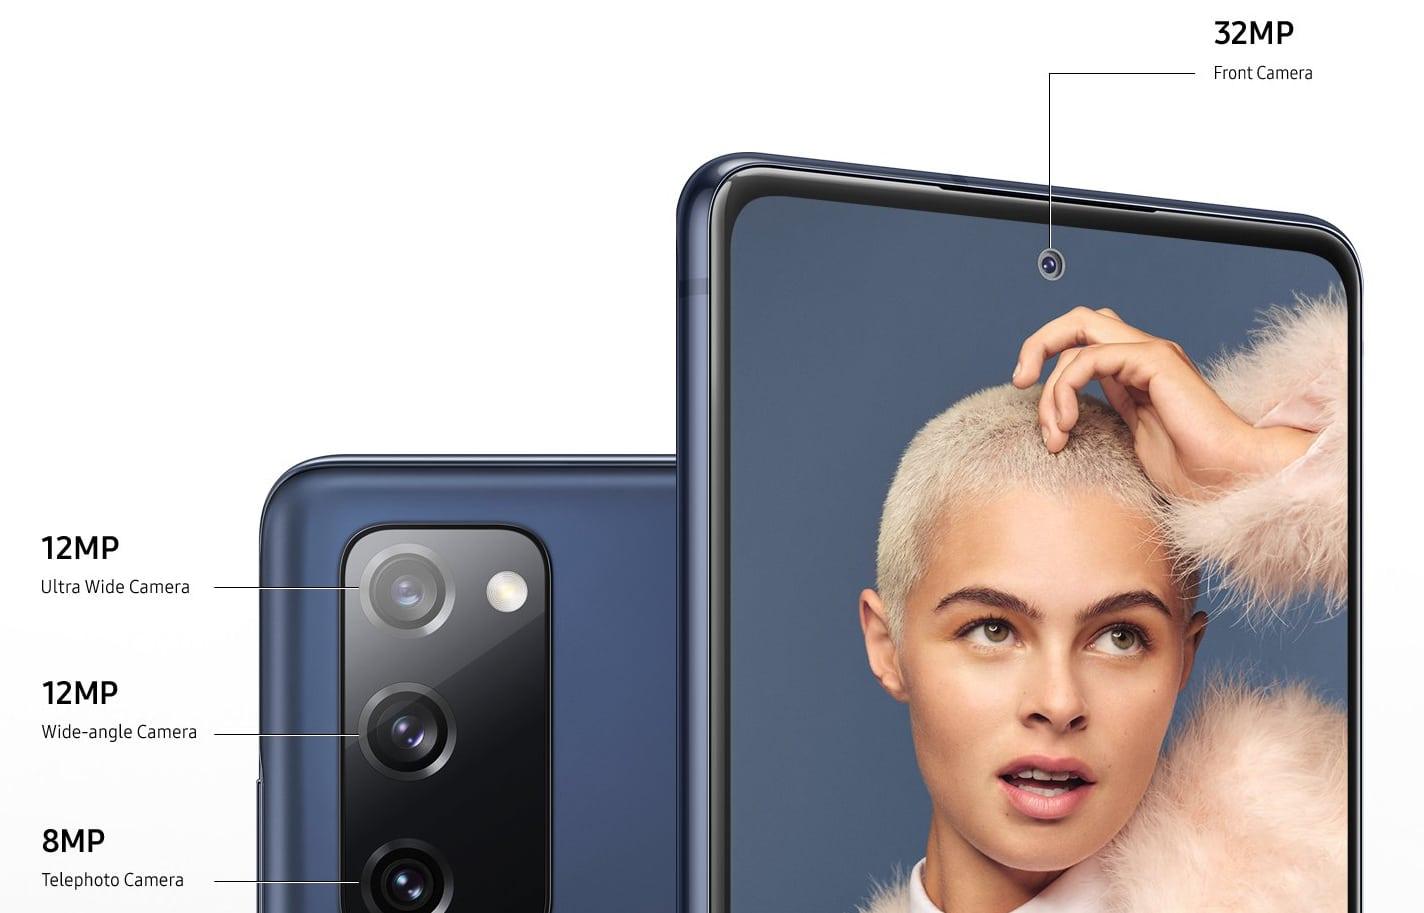 Samsung Galaxy S20 Fan Edition capteurs photo